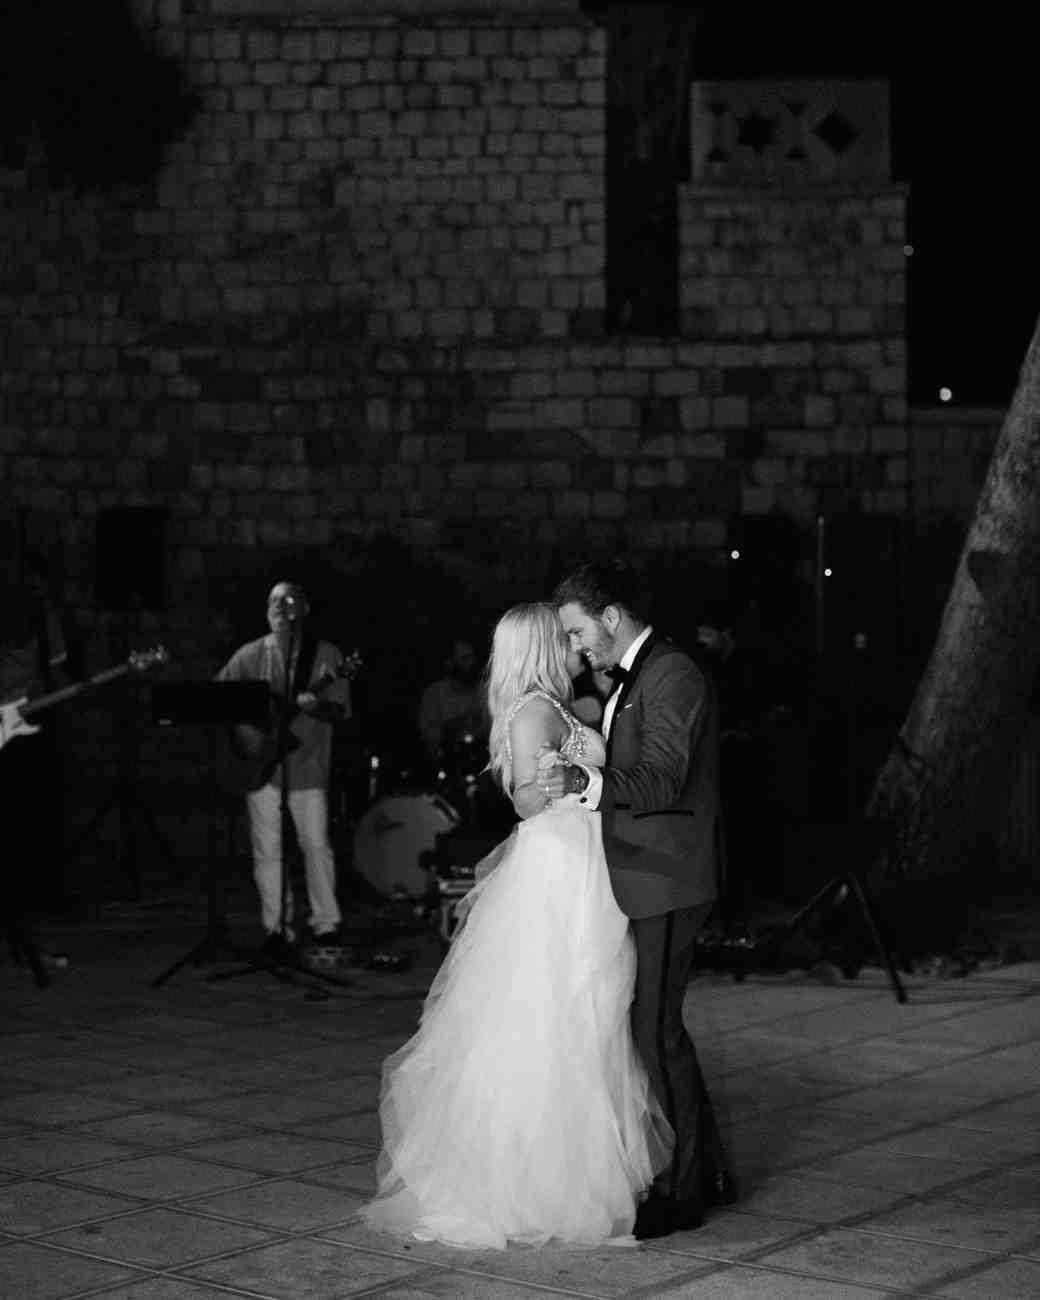 melissa-mike-wedding-firstdance-0196-s112764-0316.jpg